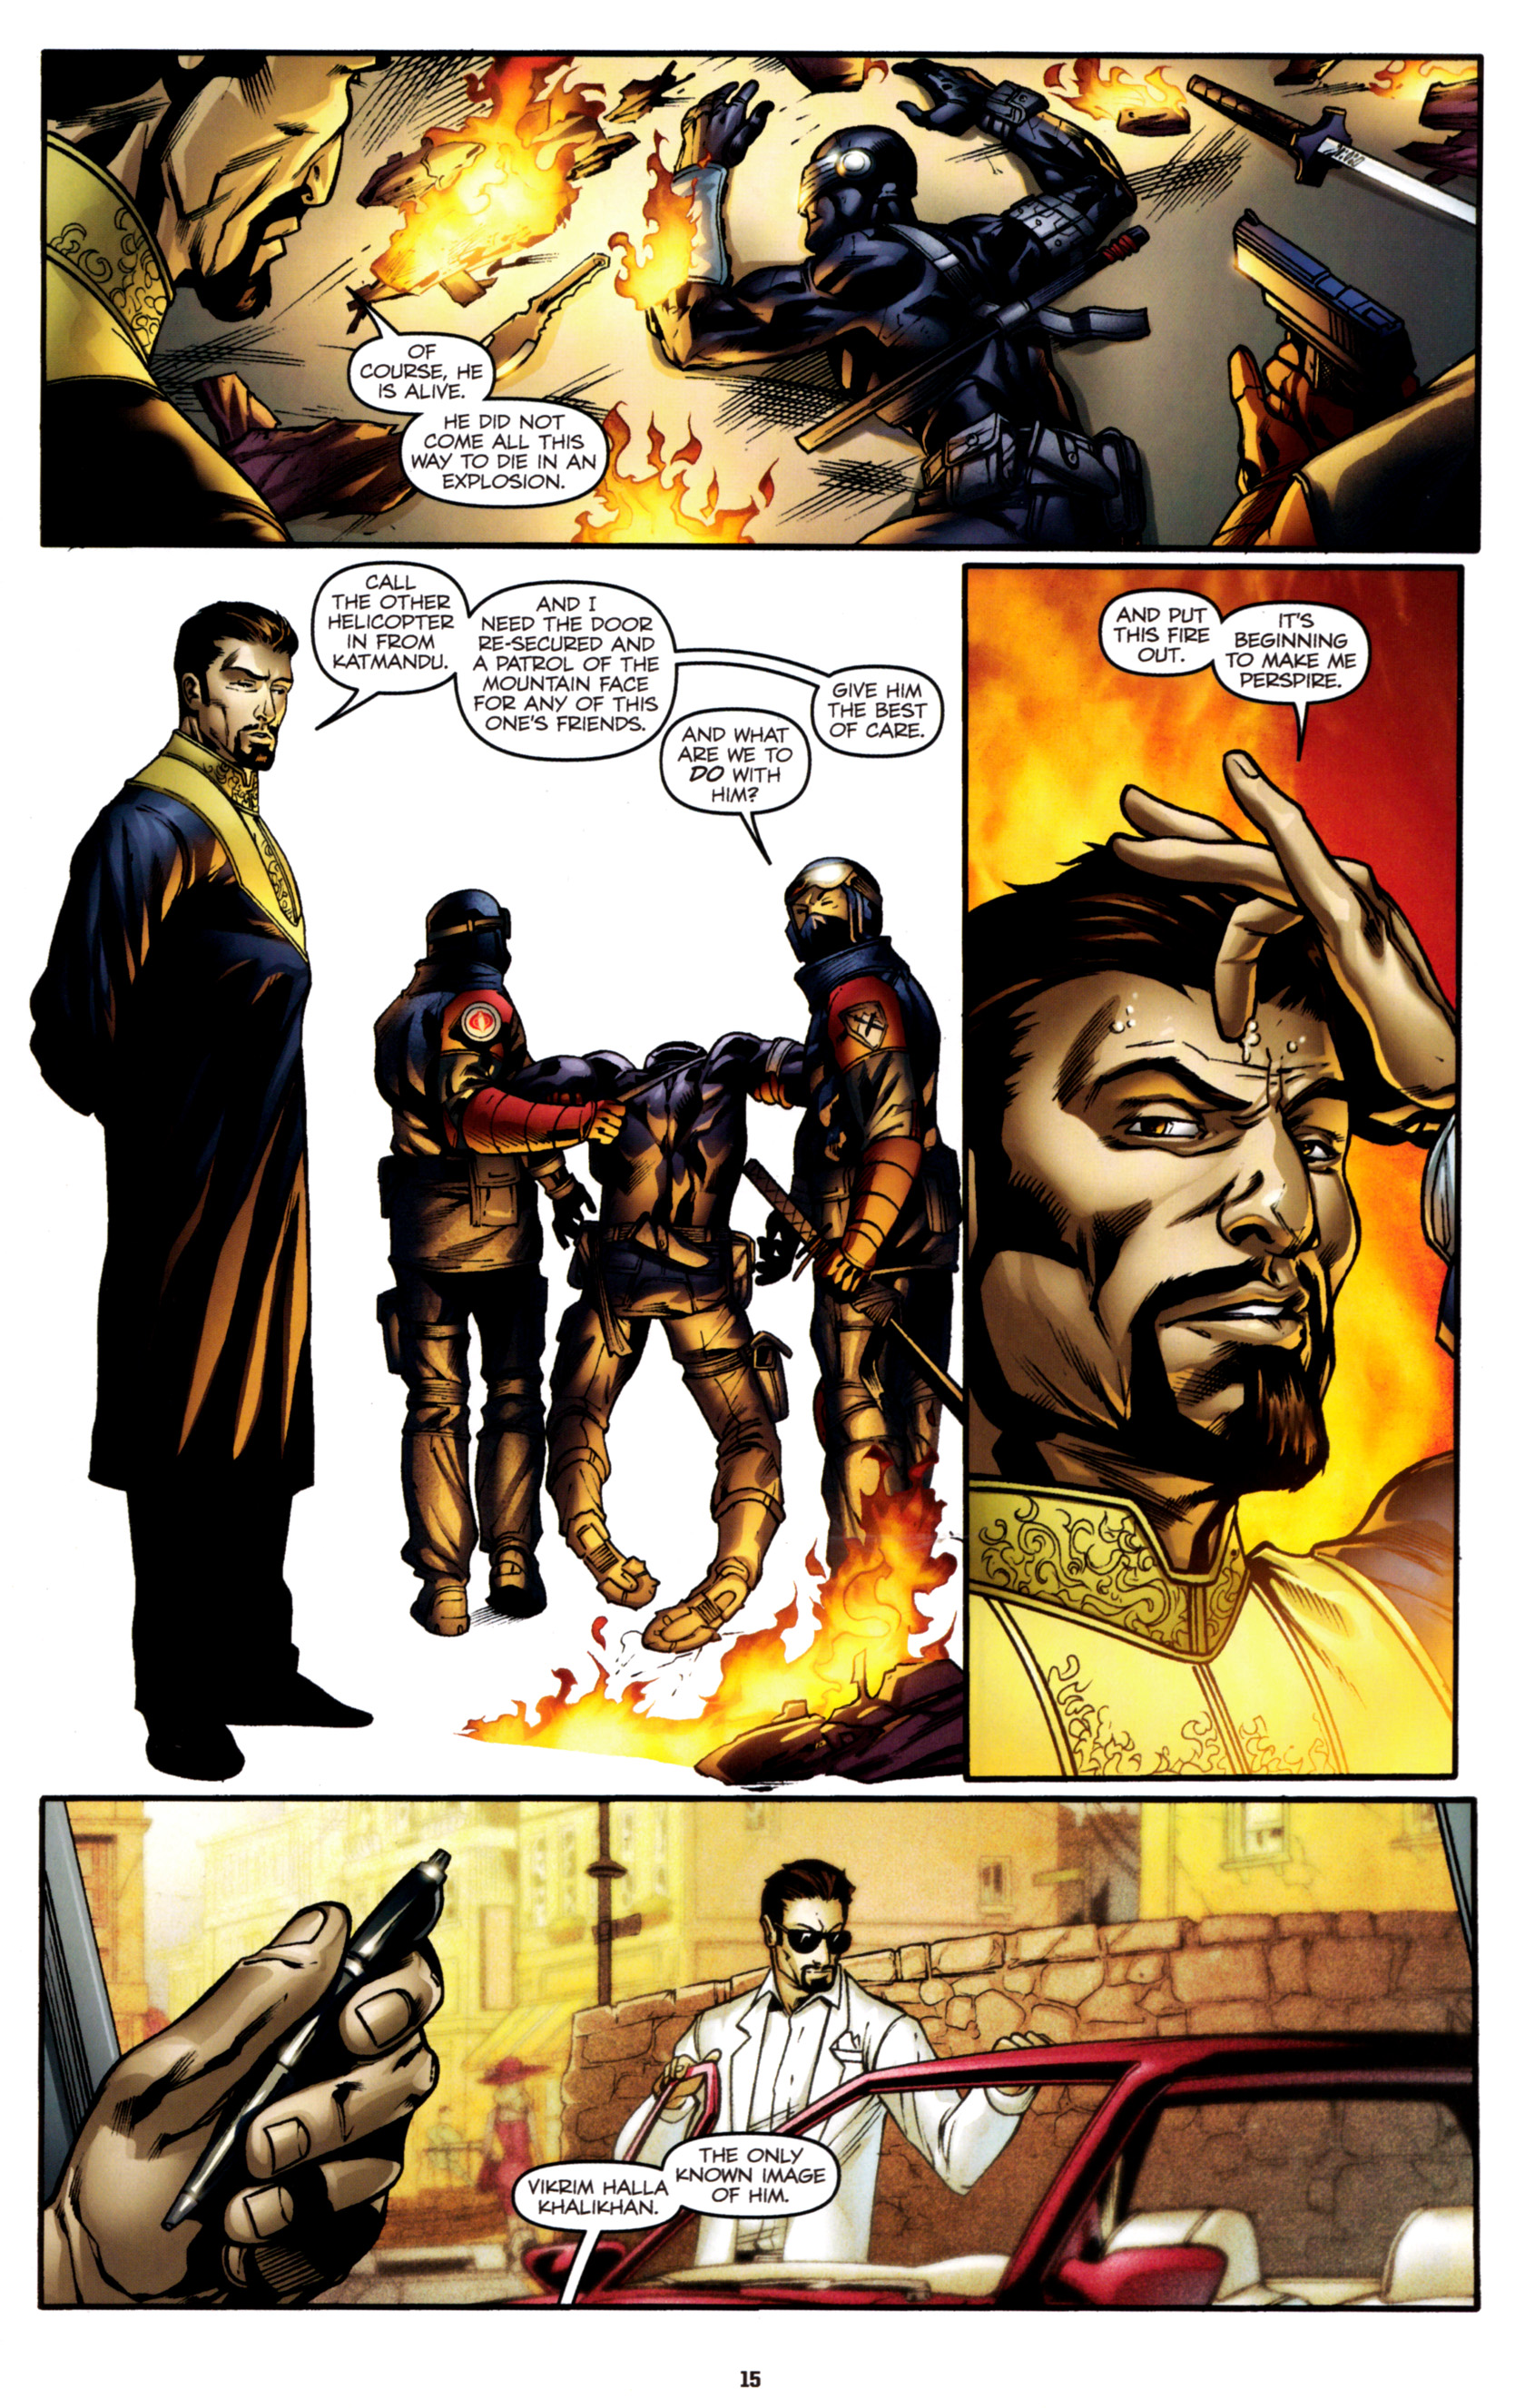 Read online G.I. Joe: Snake Eyes comic -  Issue #2 - 18